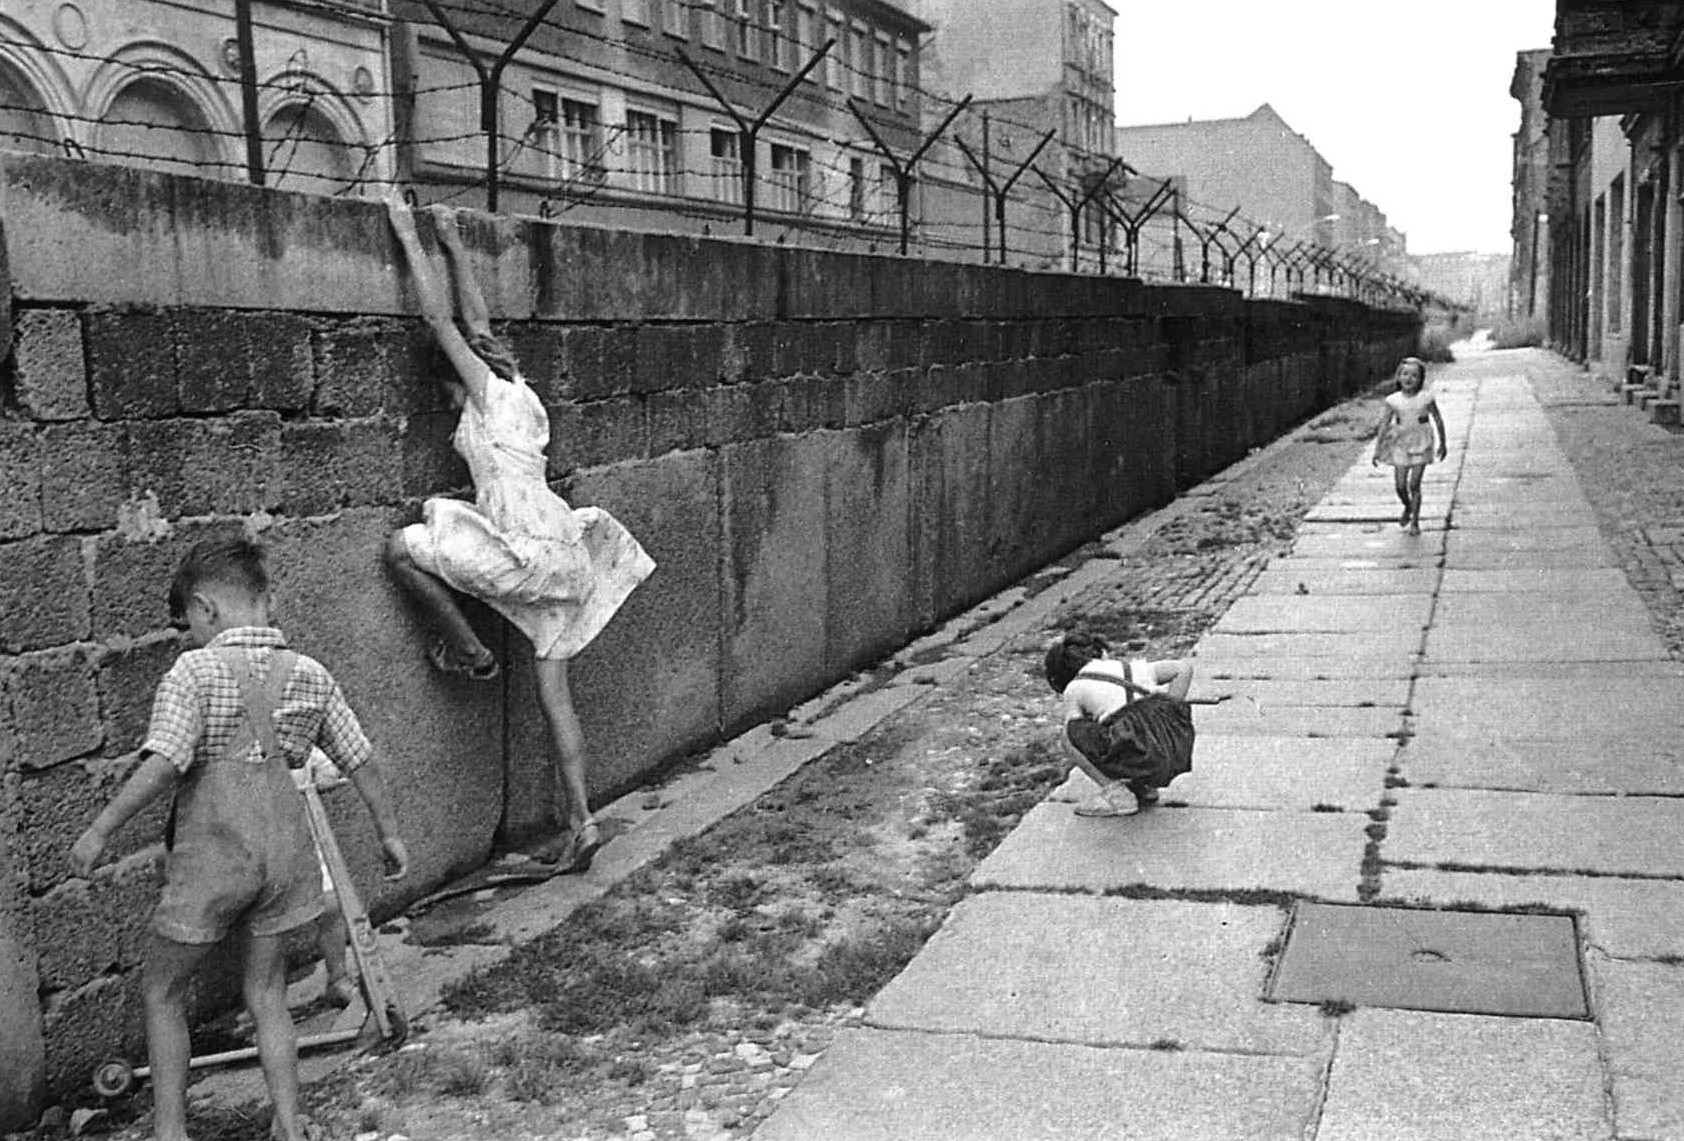 Henri Cartier-Bresson. Berlyno siena. 1962.